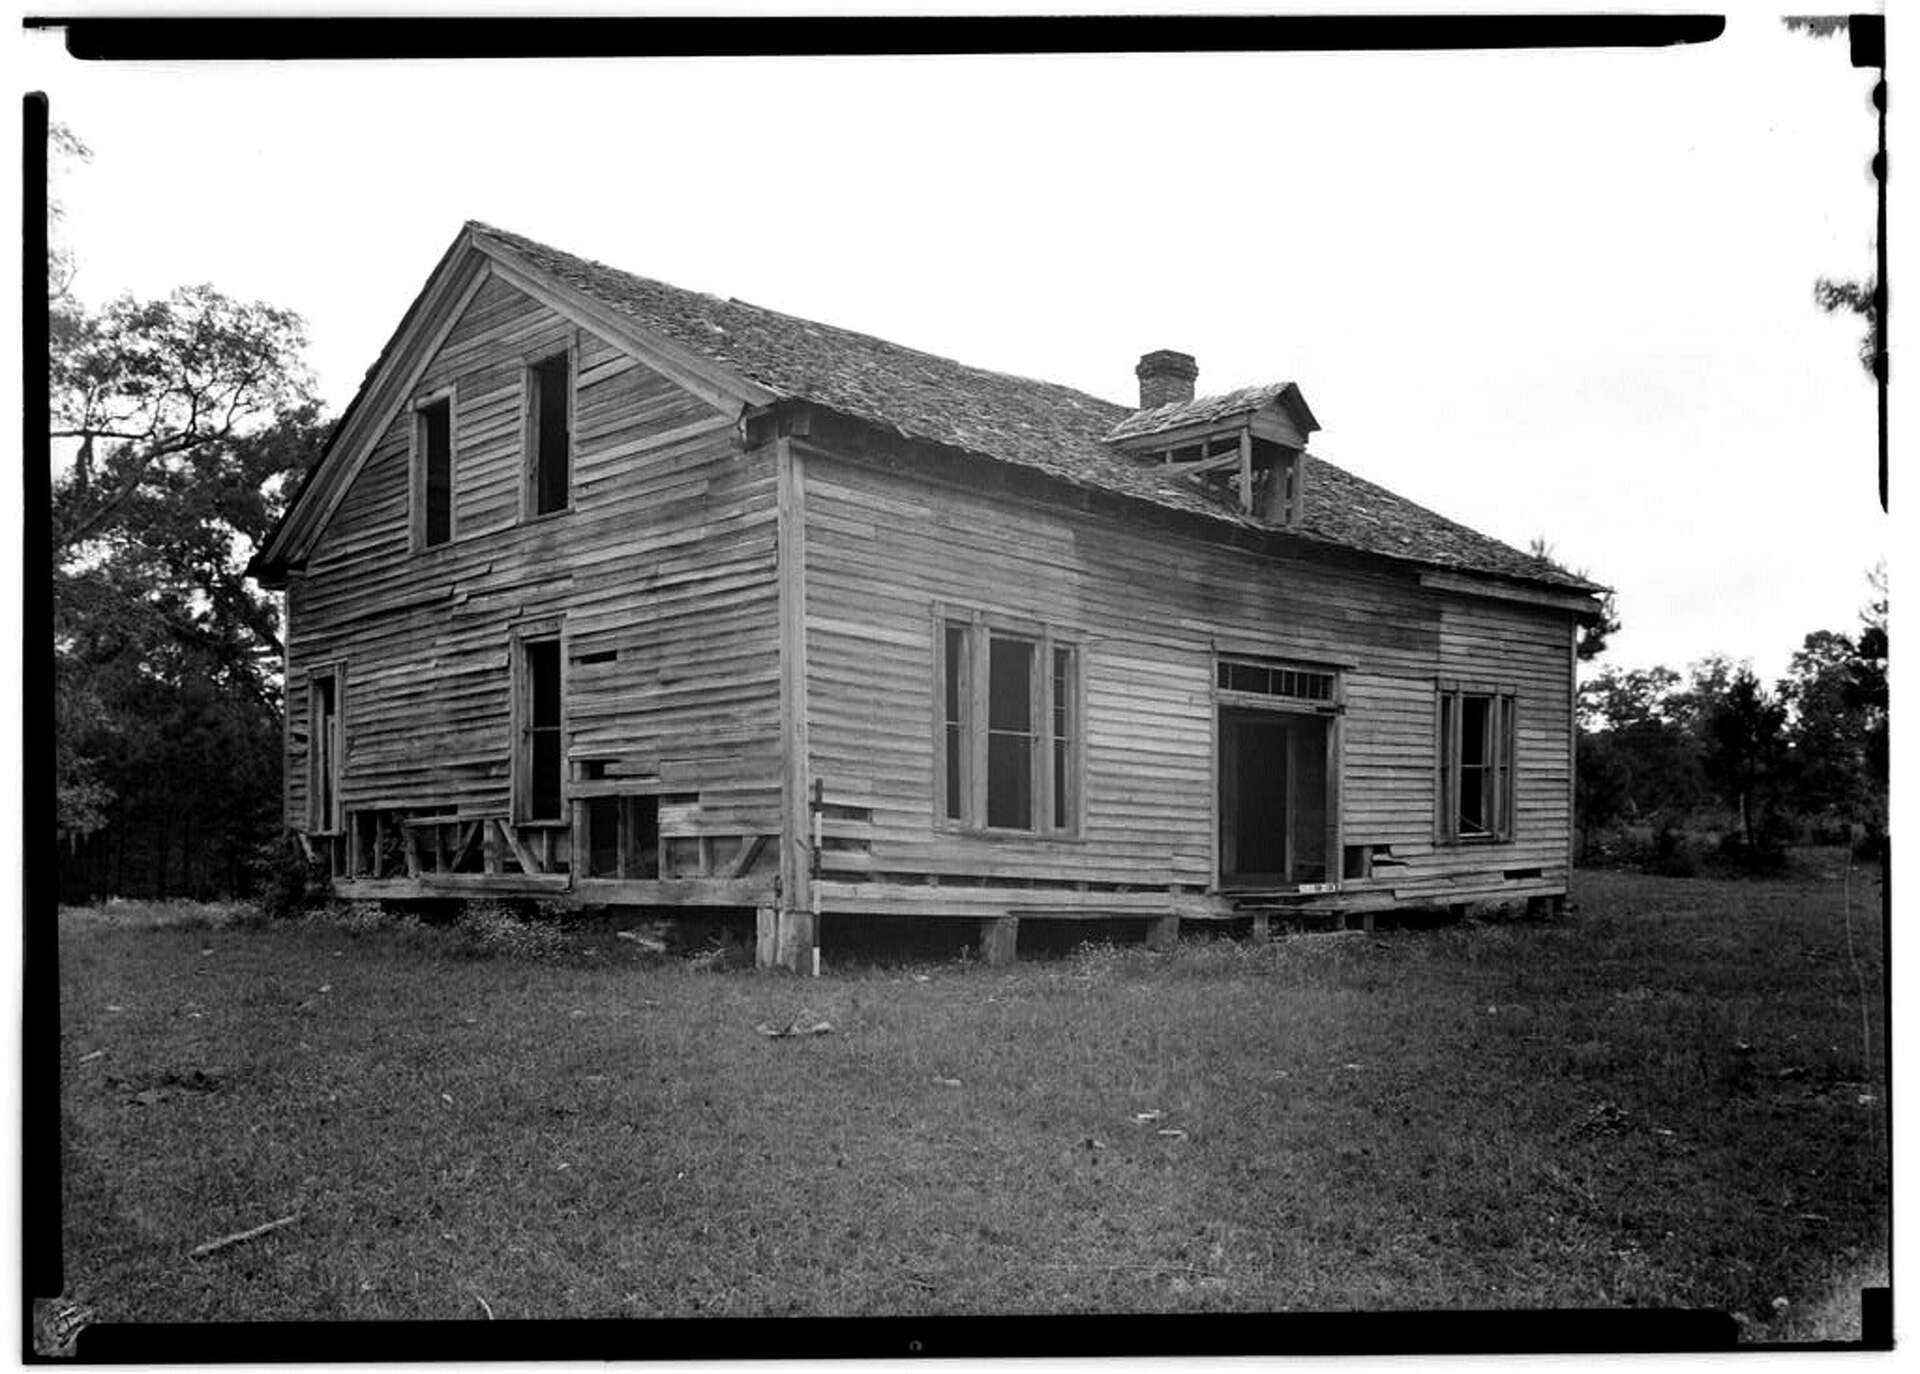 1920x1920.jpg